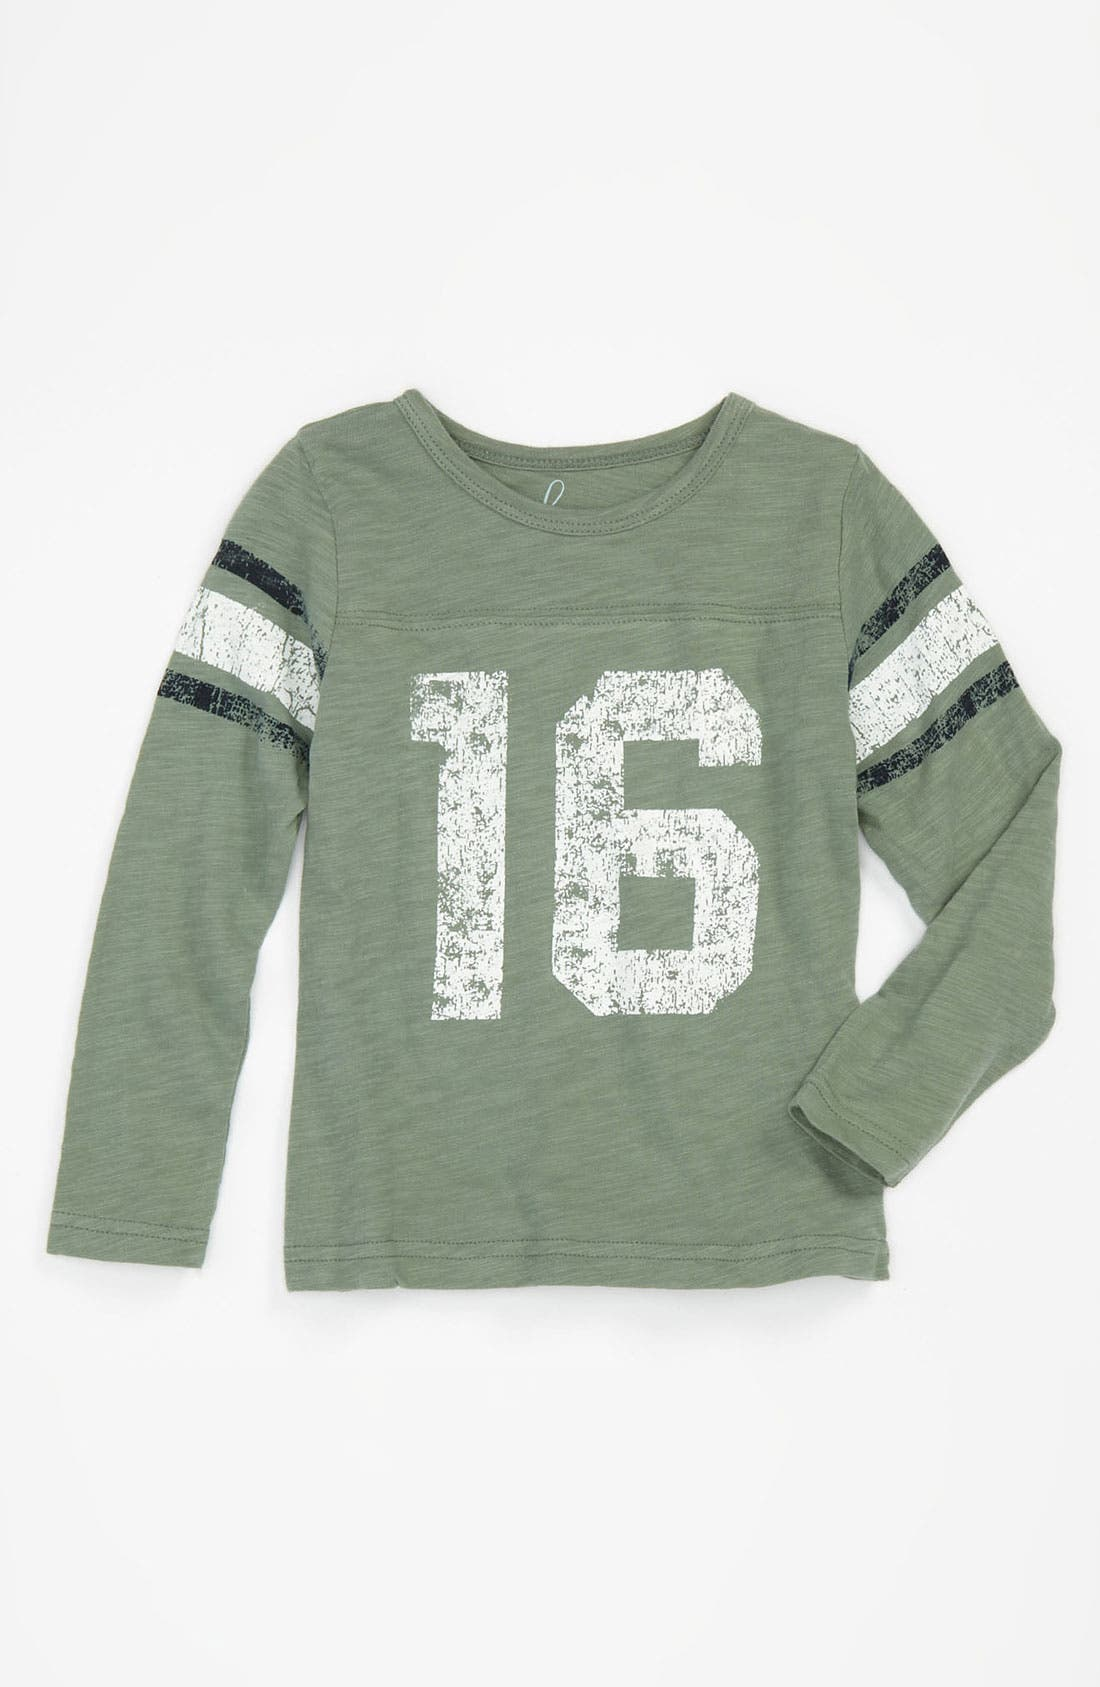 Alternate Image 1 Selected - Peek '16' Sport Jersey (Infant)